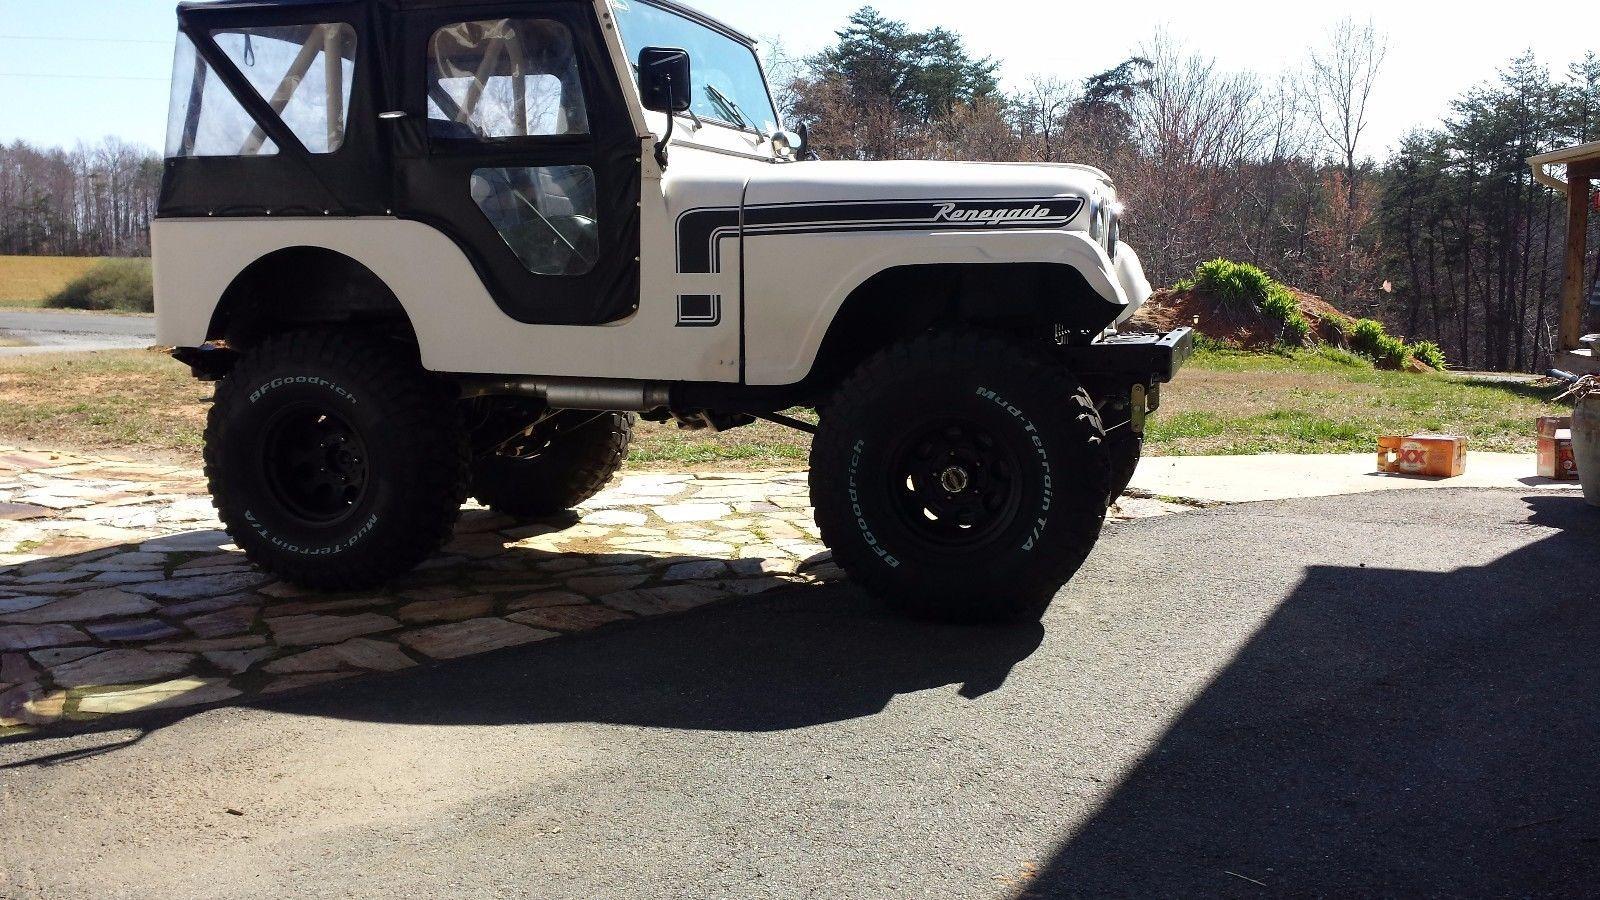 ebay 1974 jeep cj renegade 1974 cj5 renegade 304 v8 jeep jeeplife usdeals rssdata net [ 1600 x 900 Pixel ]